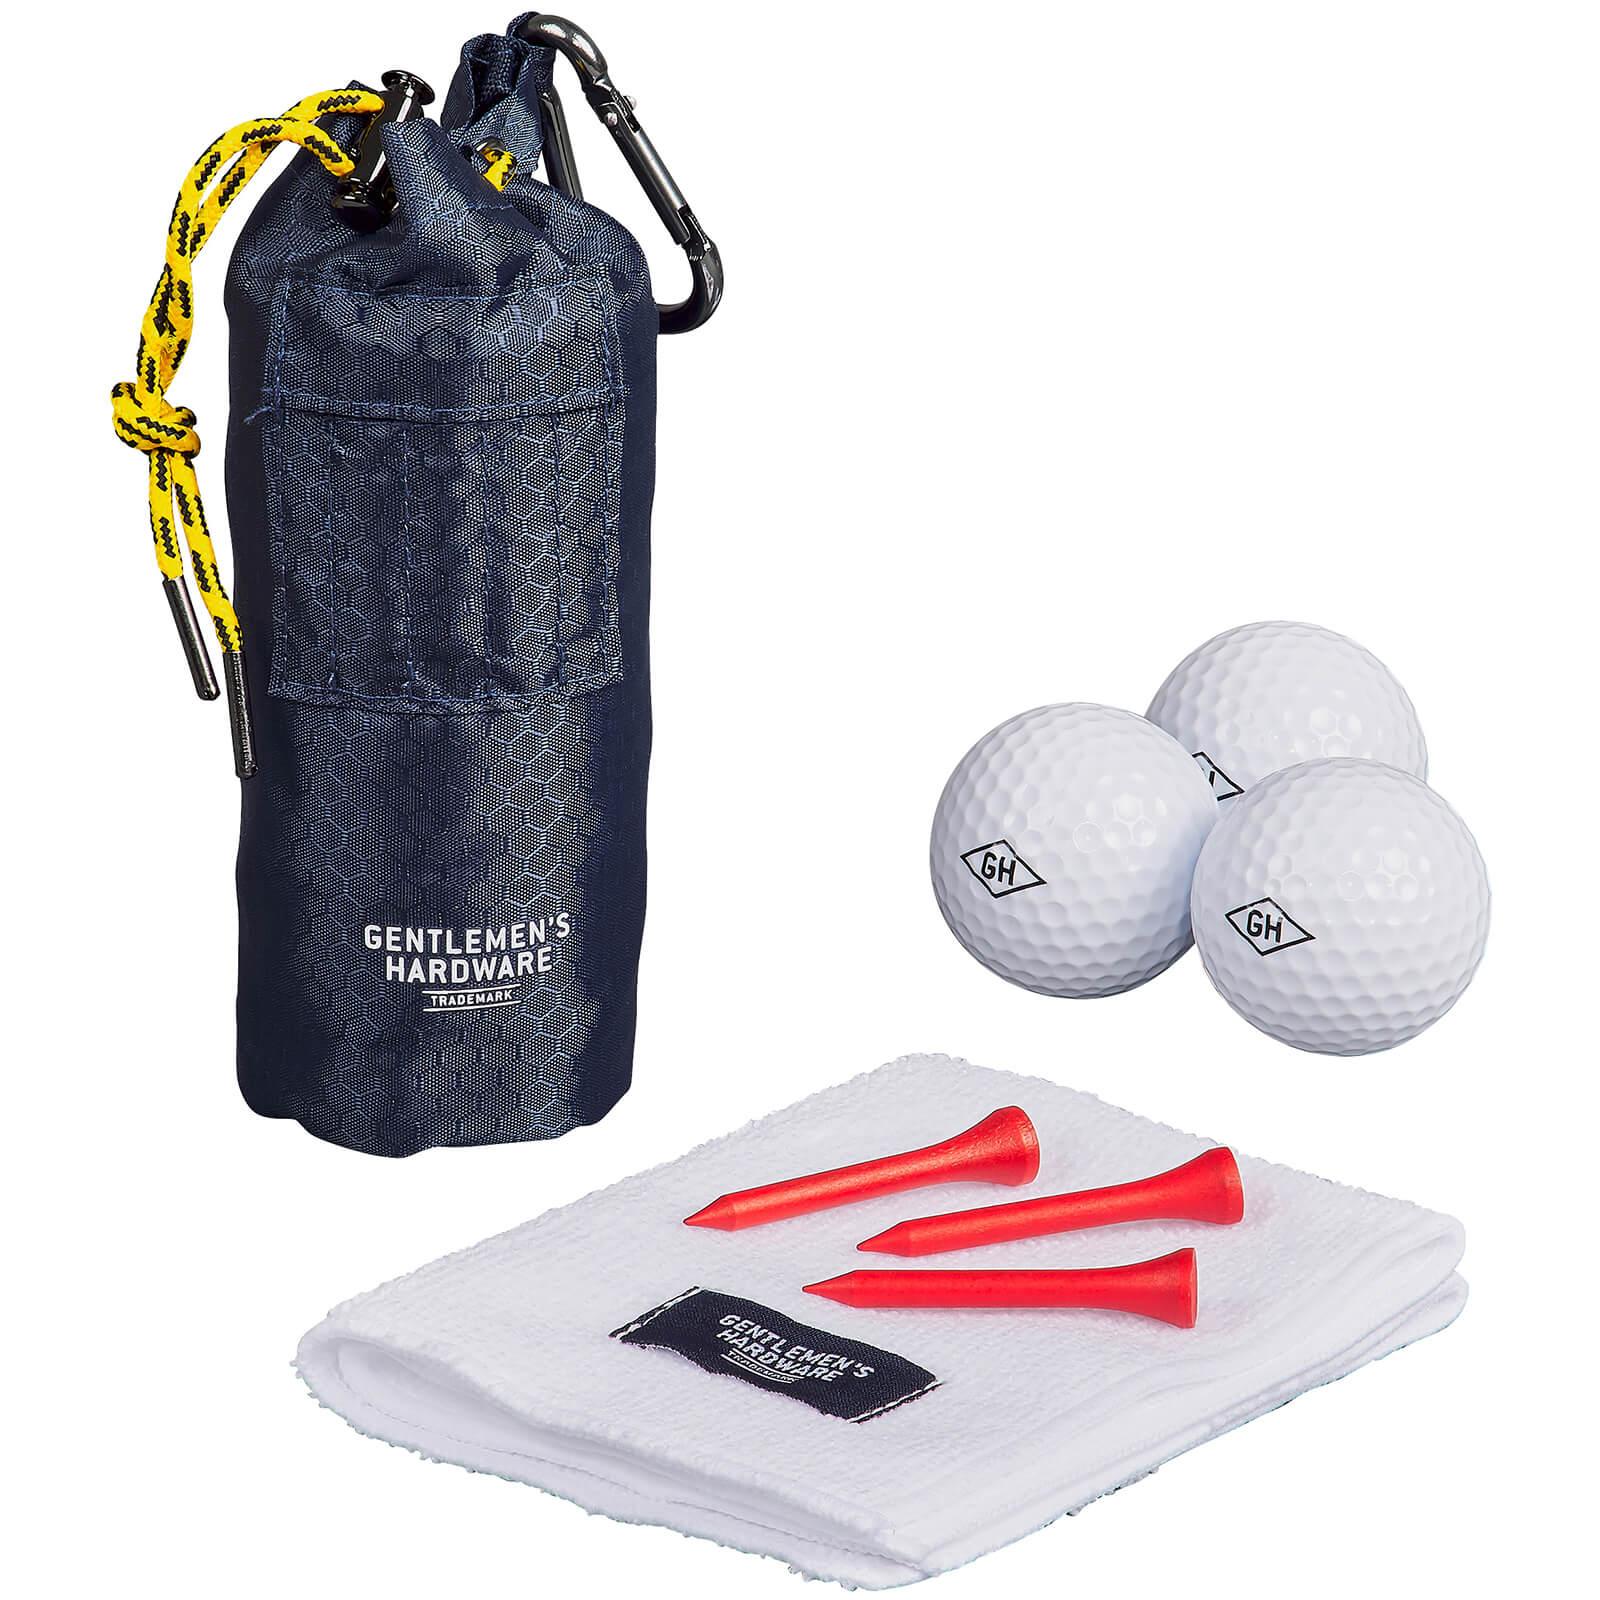 Image of Gentlemen's Hardware Golfer's Accessory Set